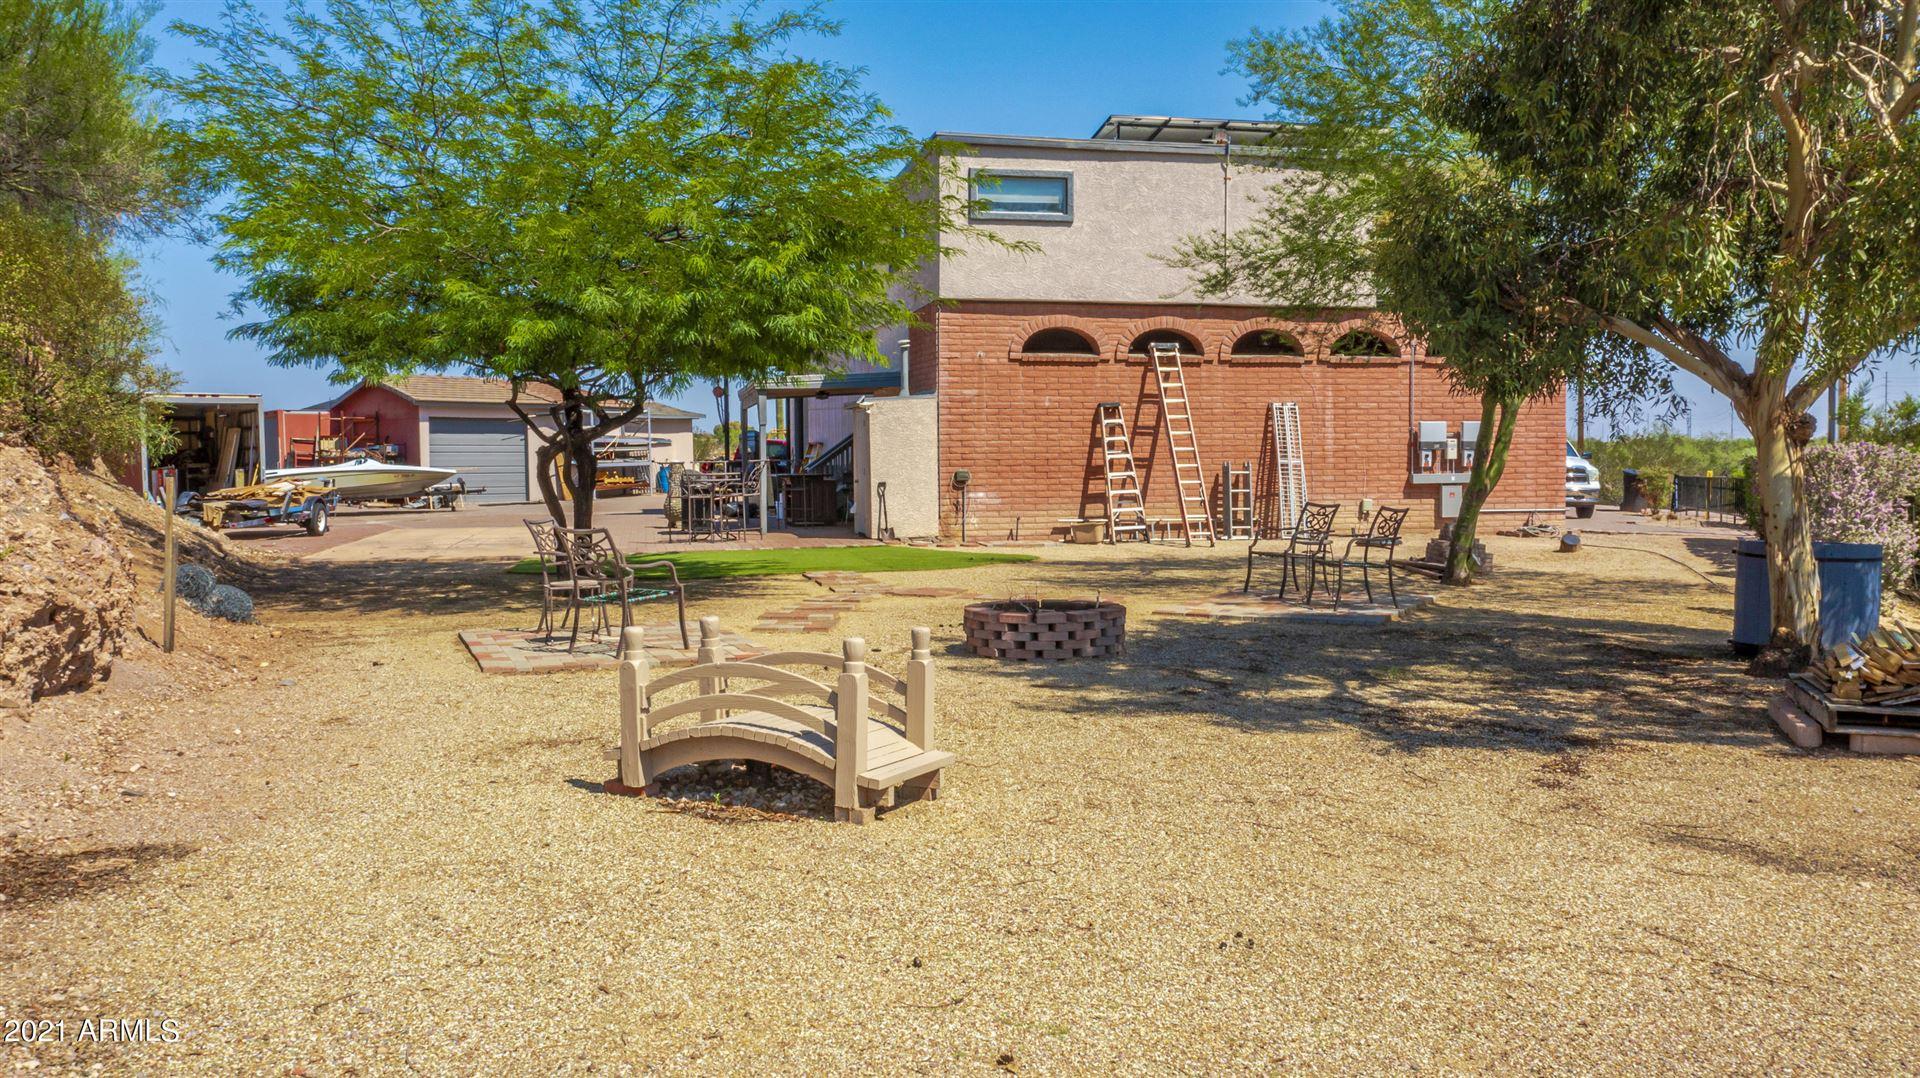 Photo of 42839 NW GRAND Avenue, Morristown, AZ 85342 (MLS # 6277982)